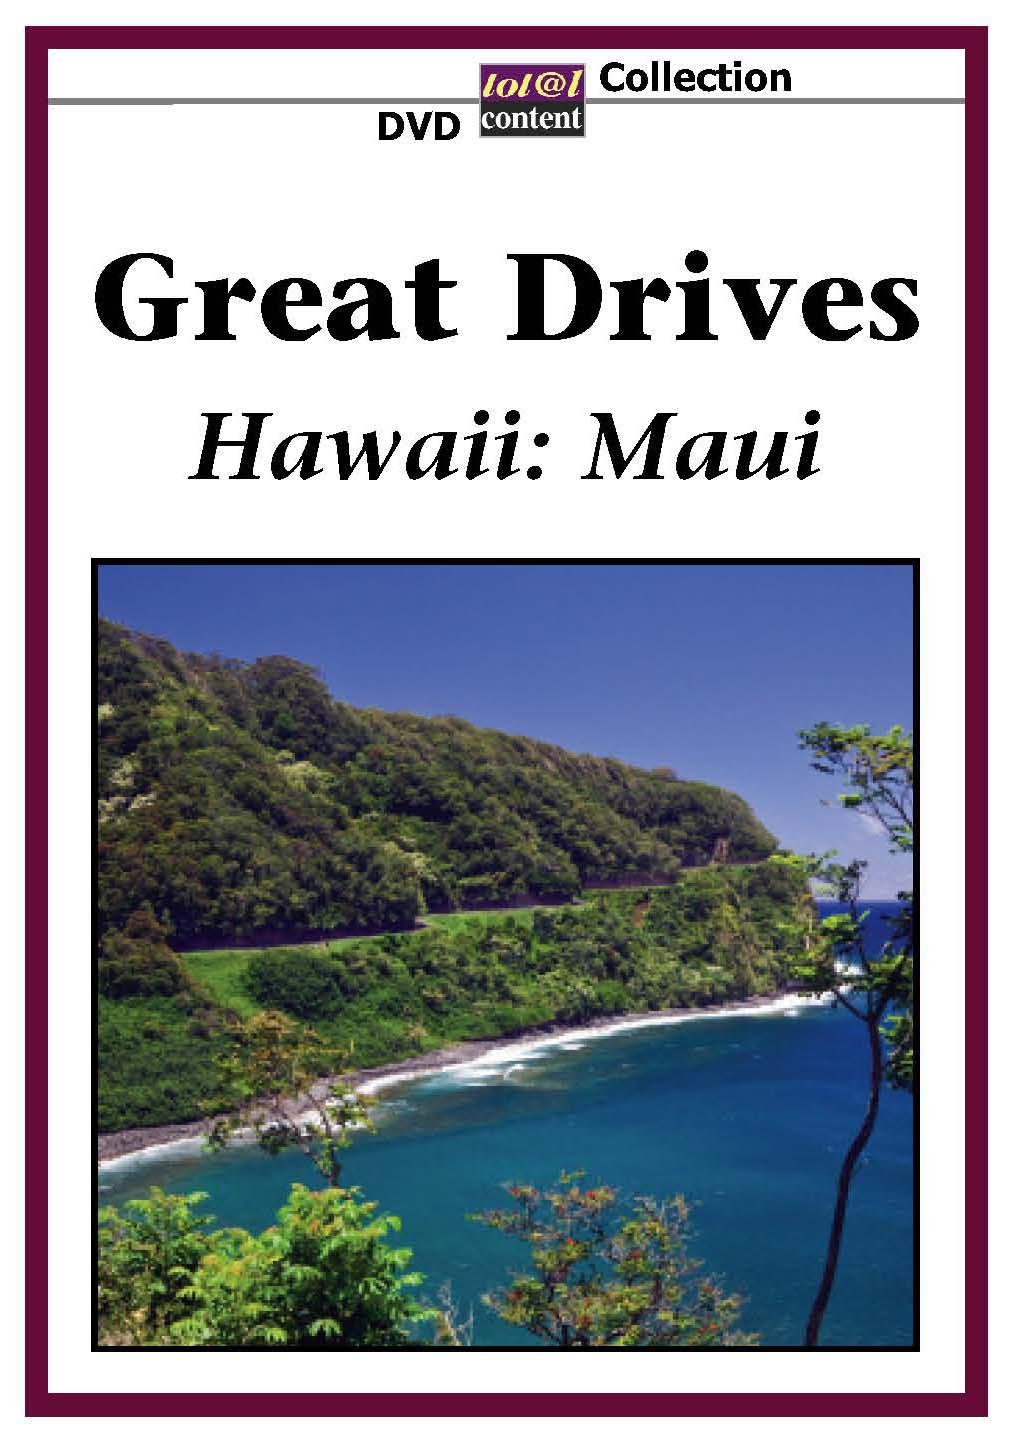 Great Drives: Hawaii - Maui